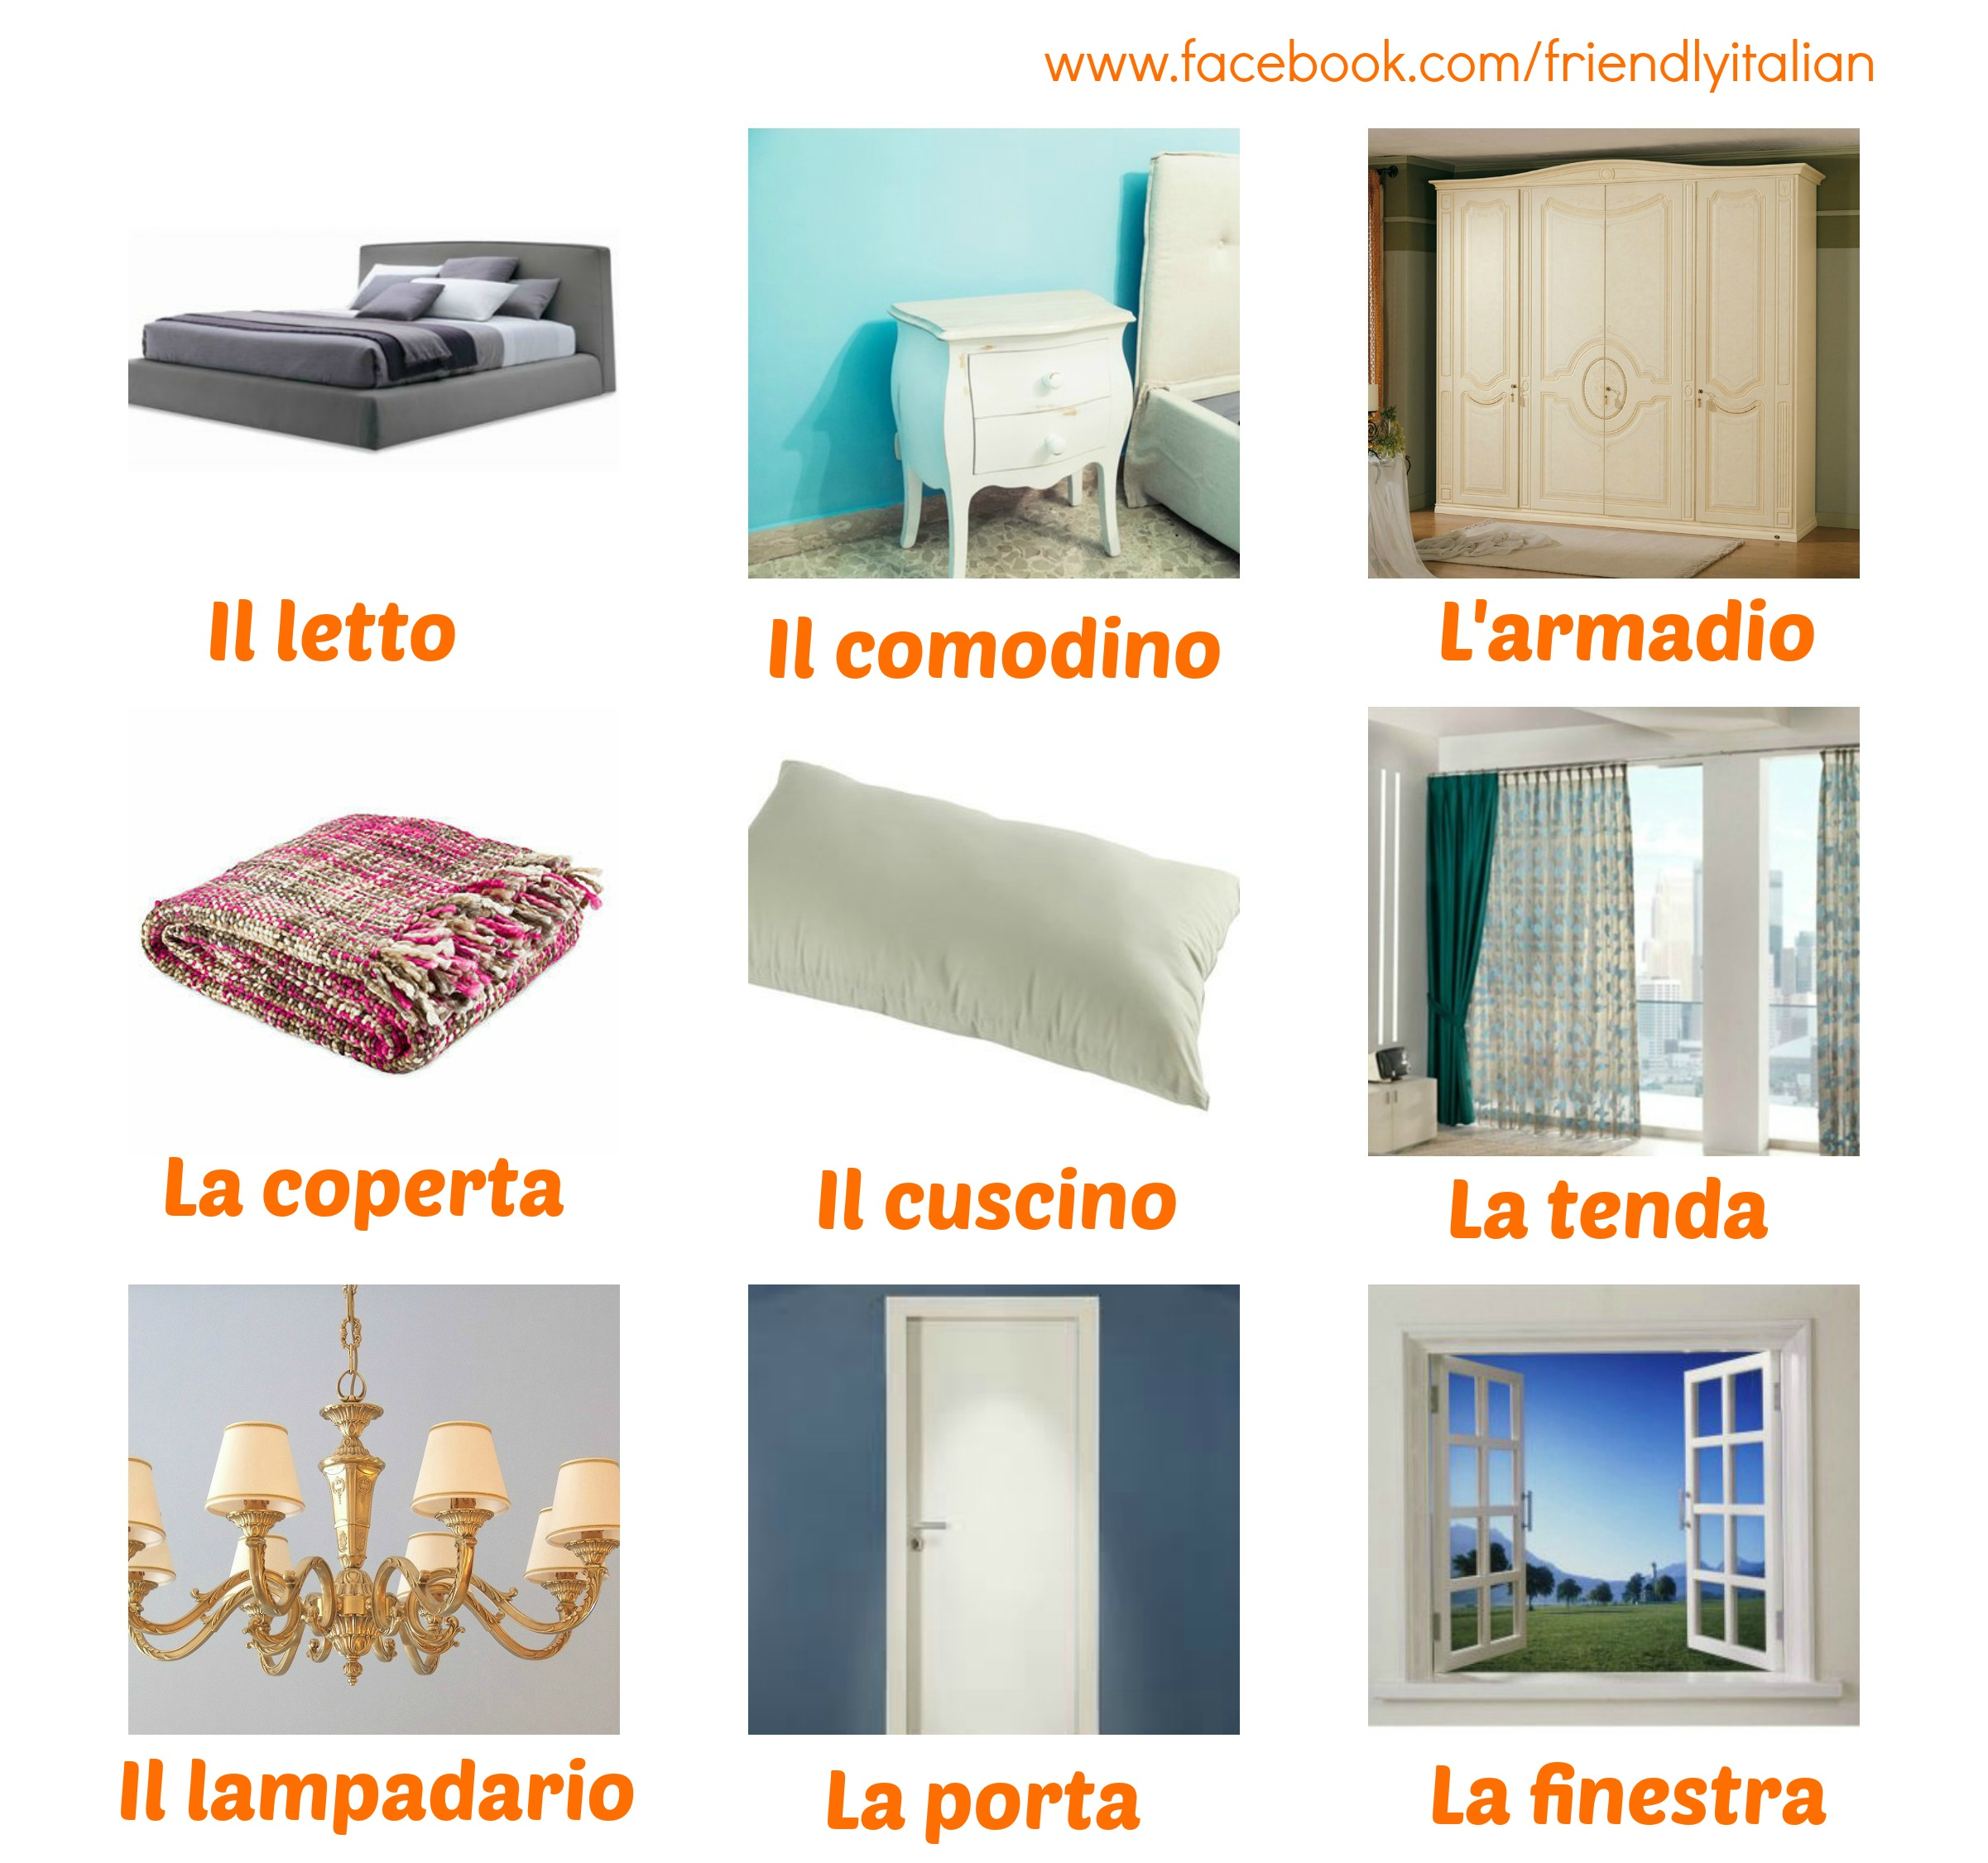 Casa dolce casa  Friendly Italian